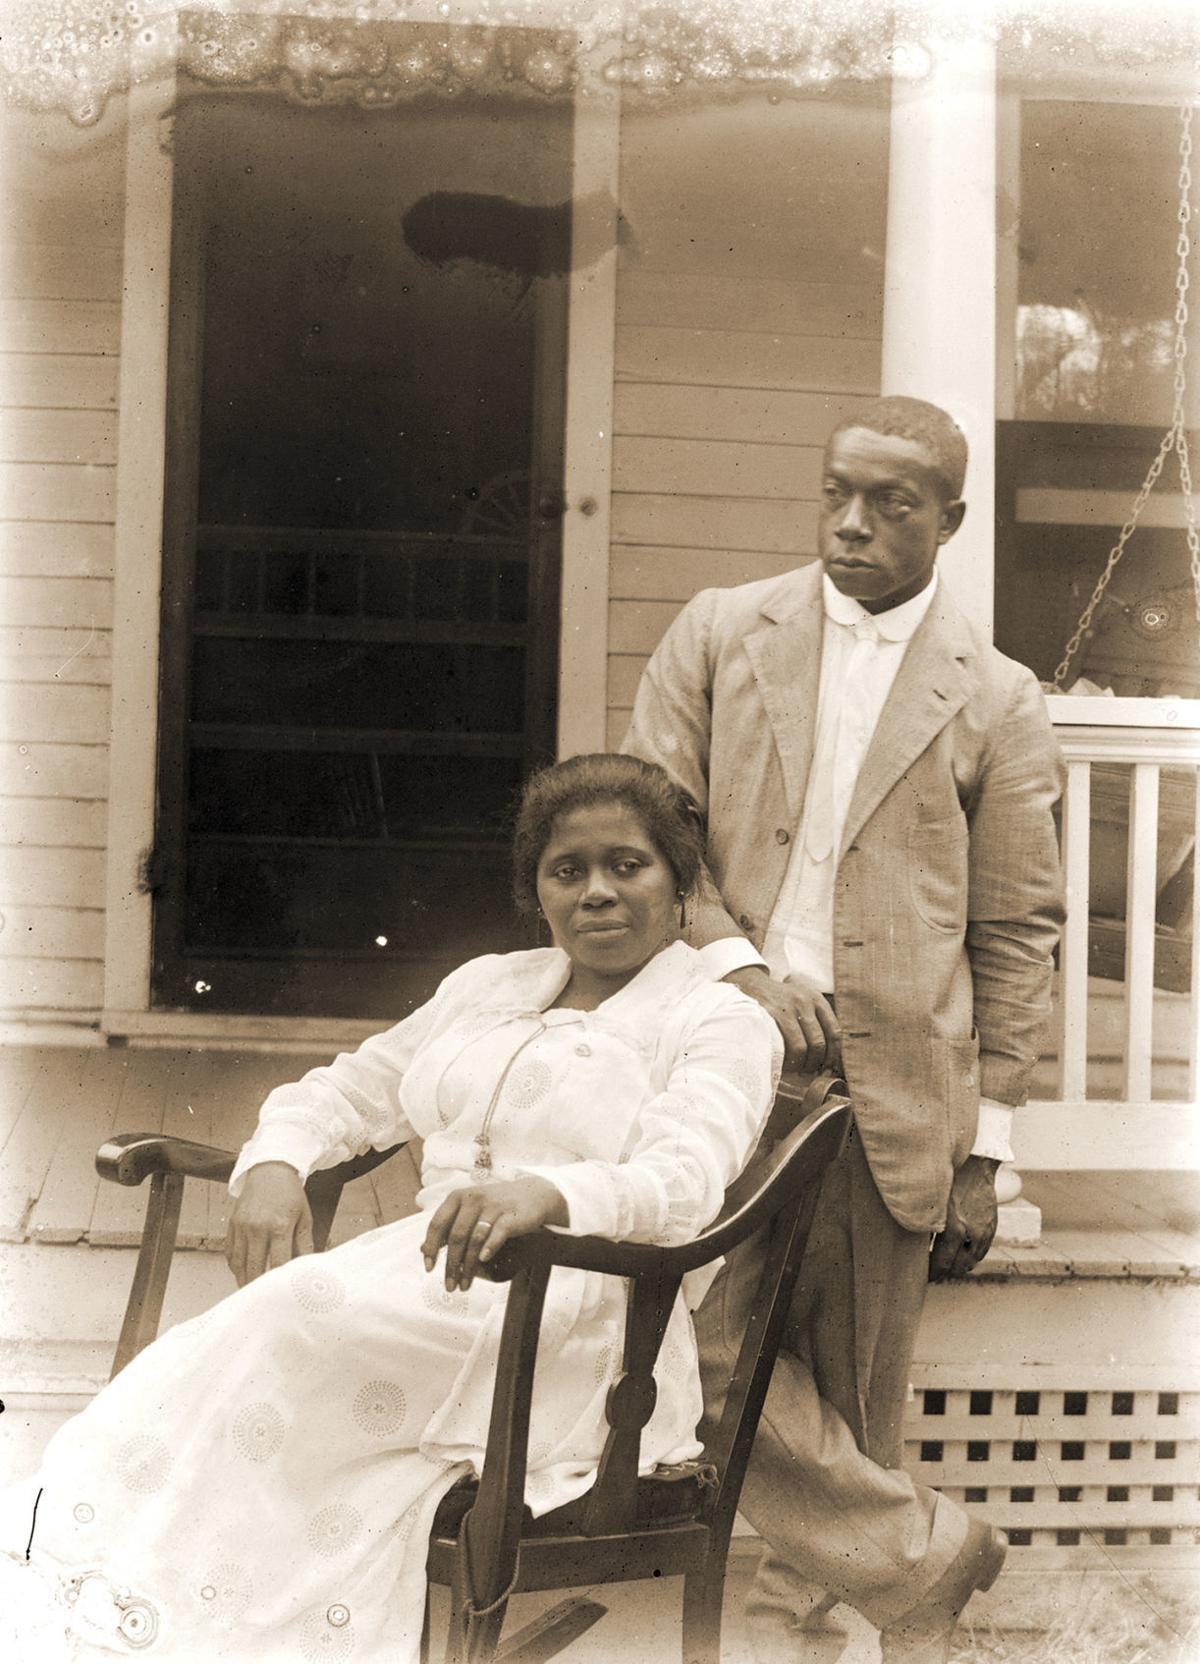 John and Odessa Johnson